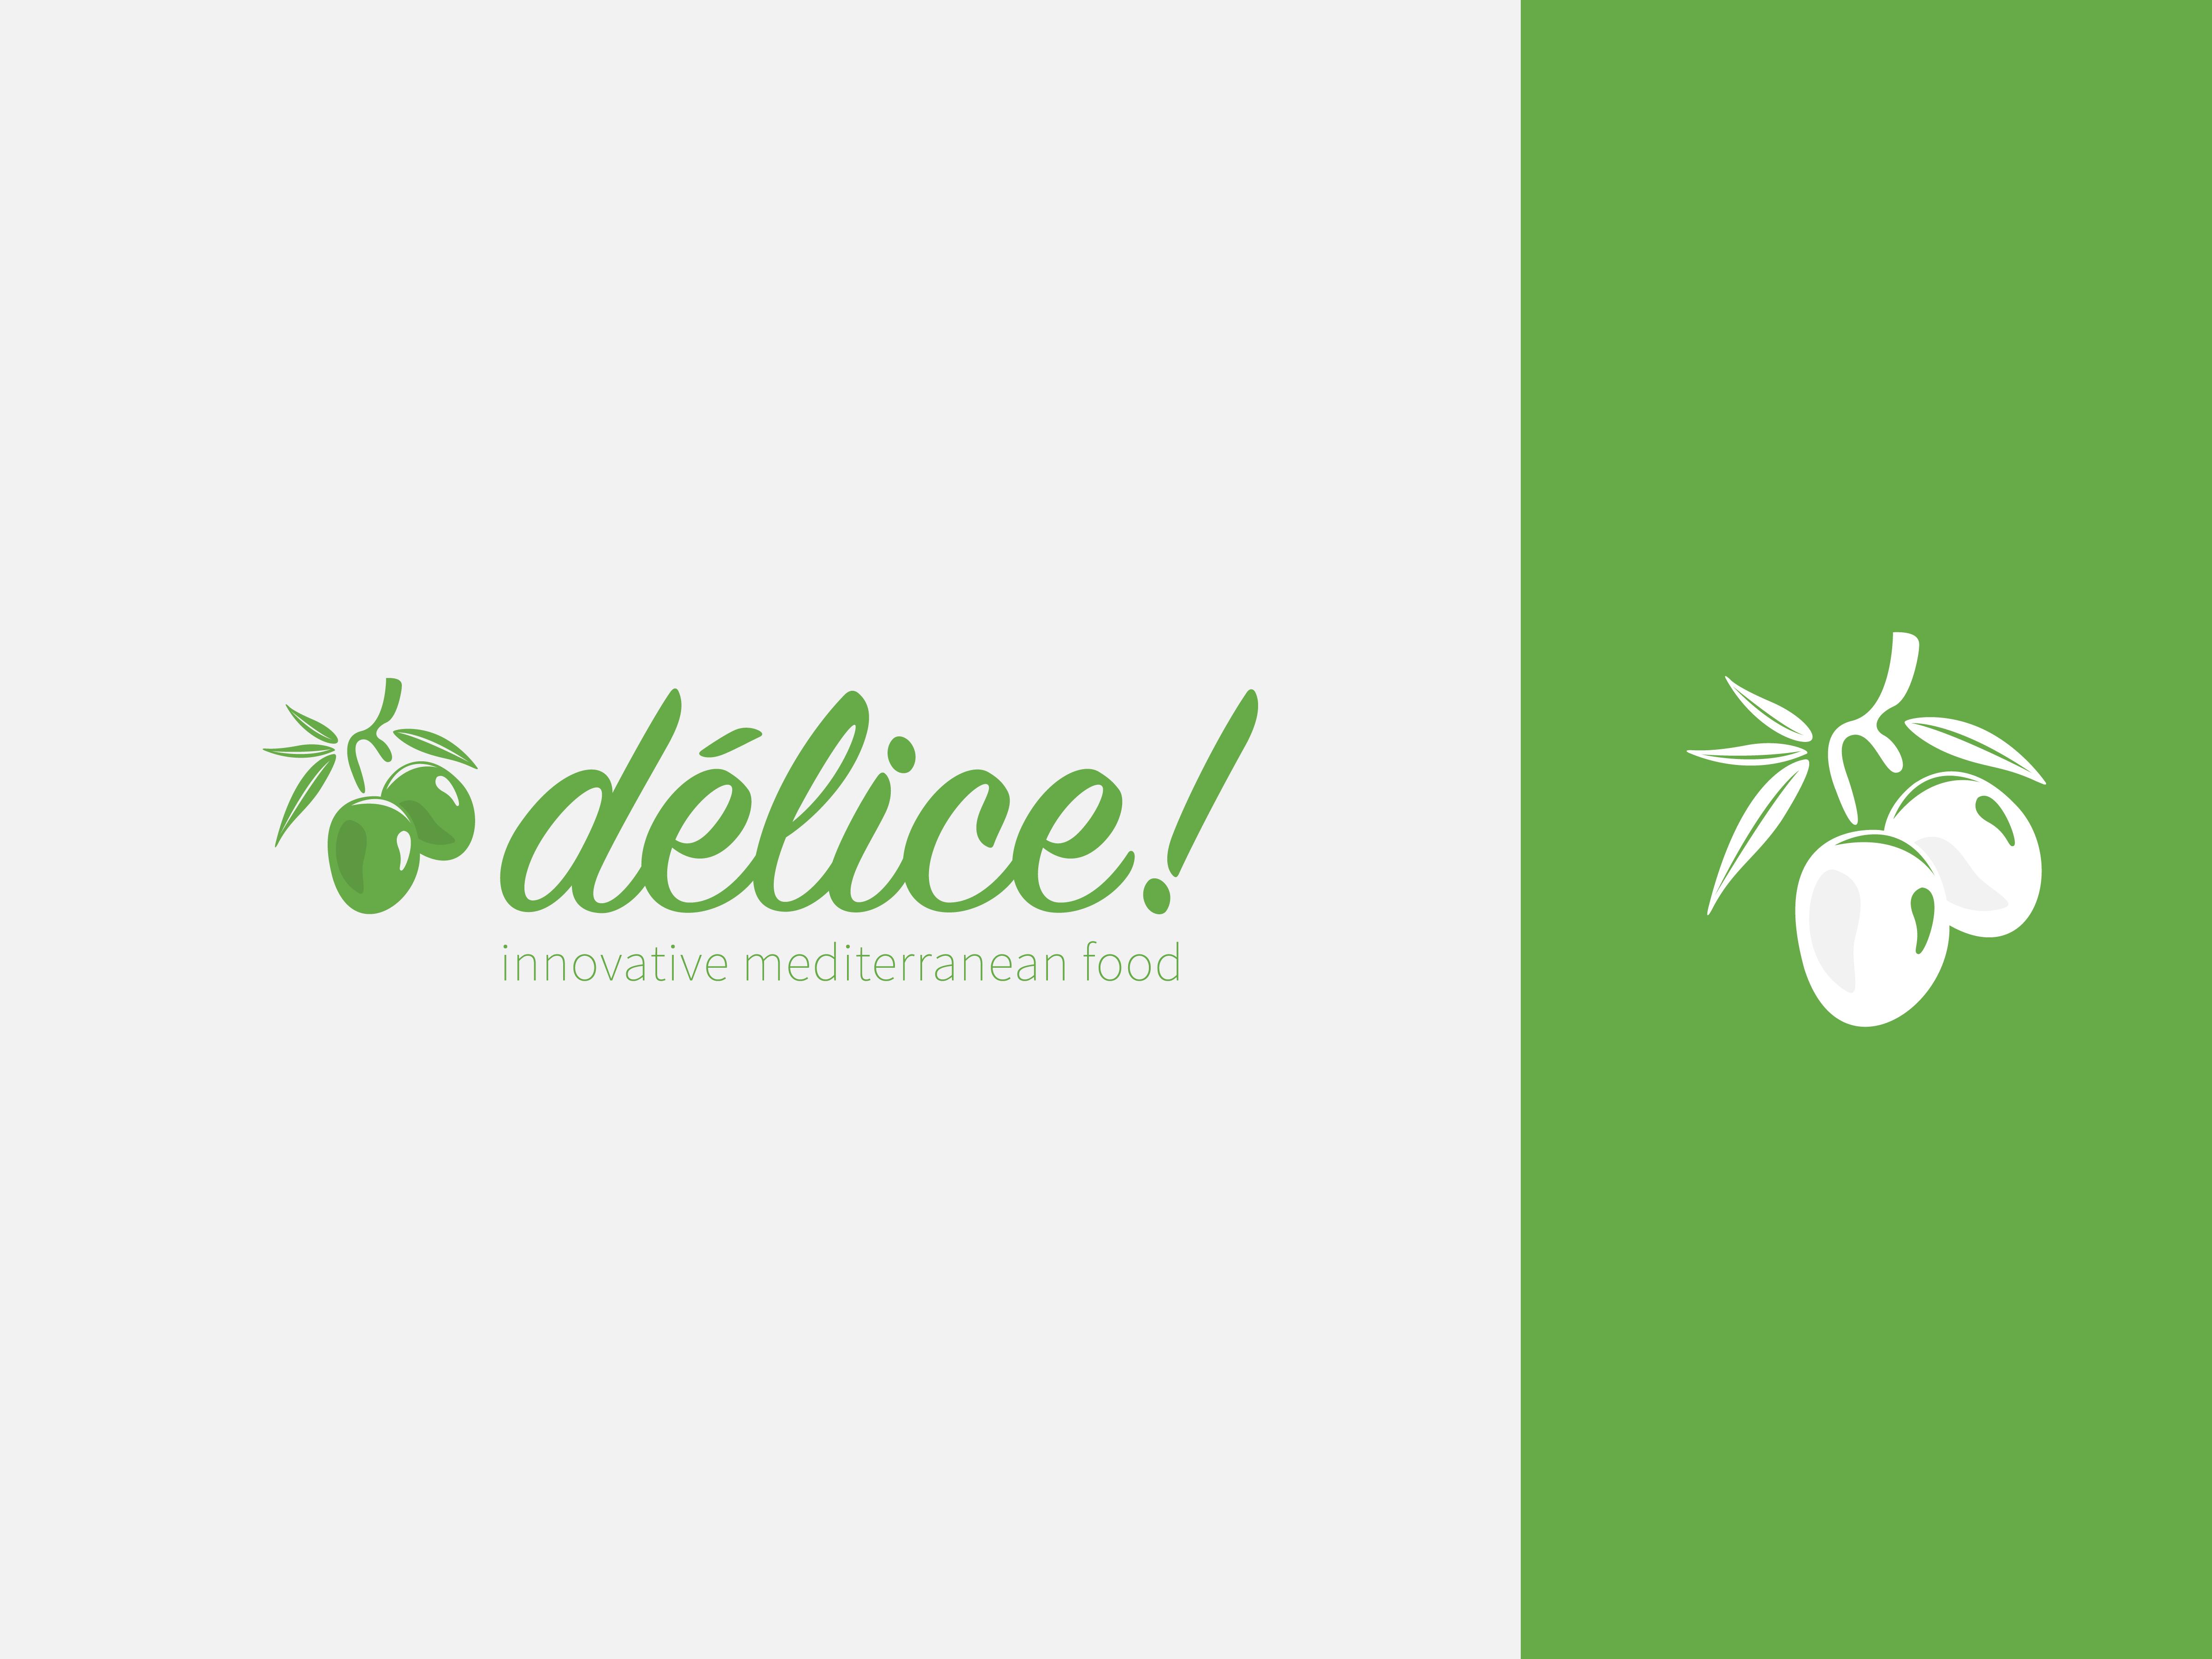 projekt_delice